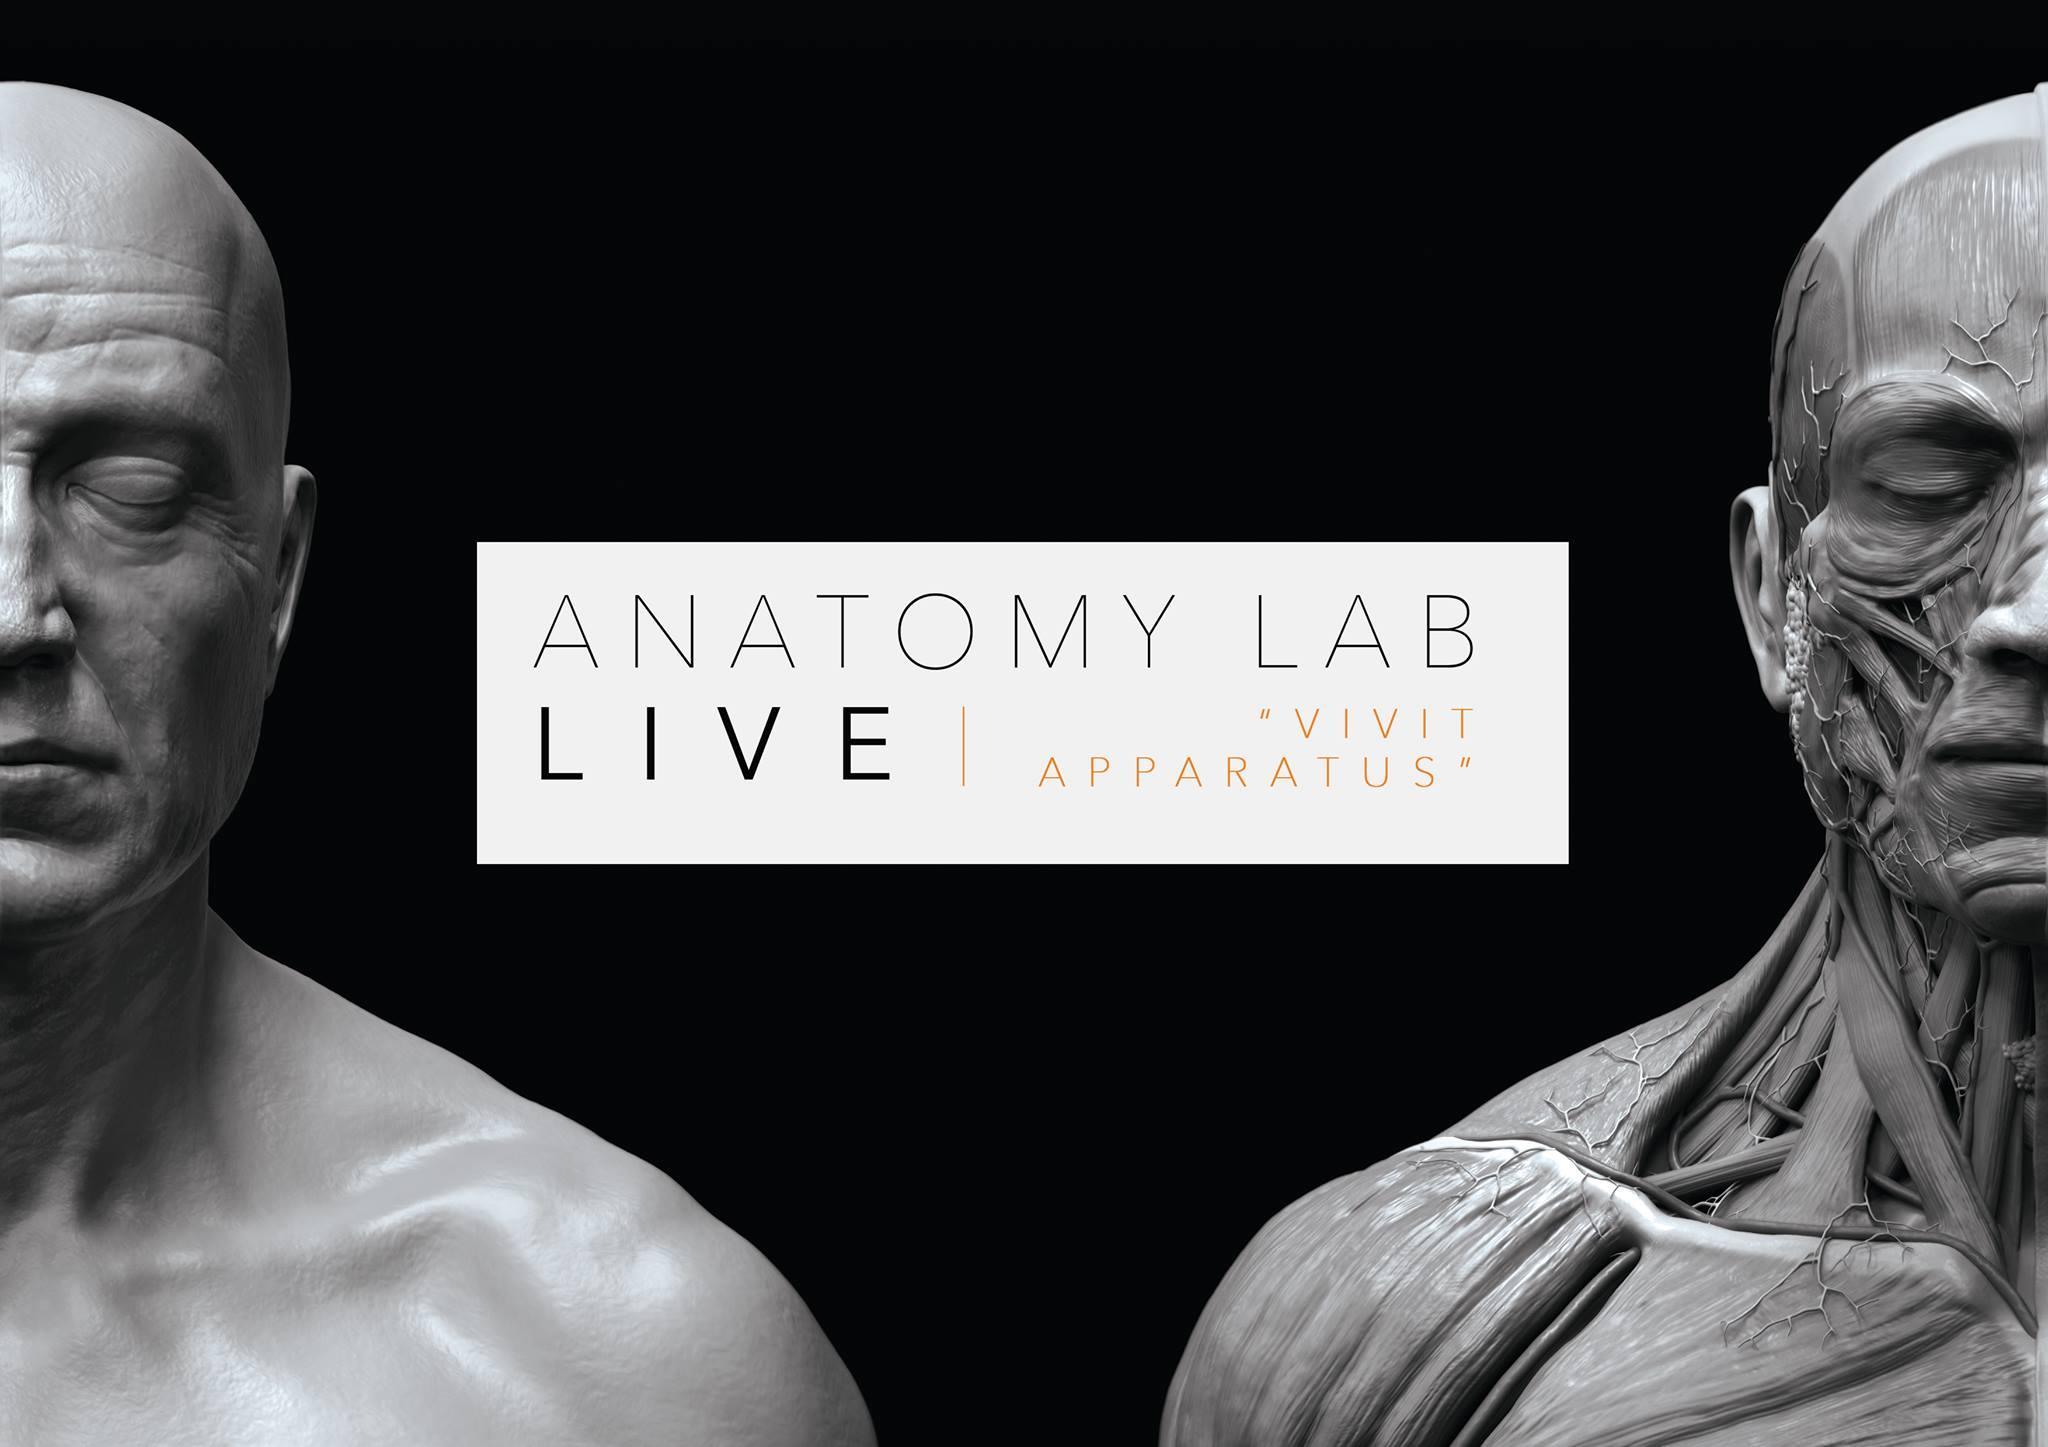 ANATOMY LAB LIVE | NOTTINGHAM 18/02/2018